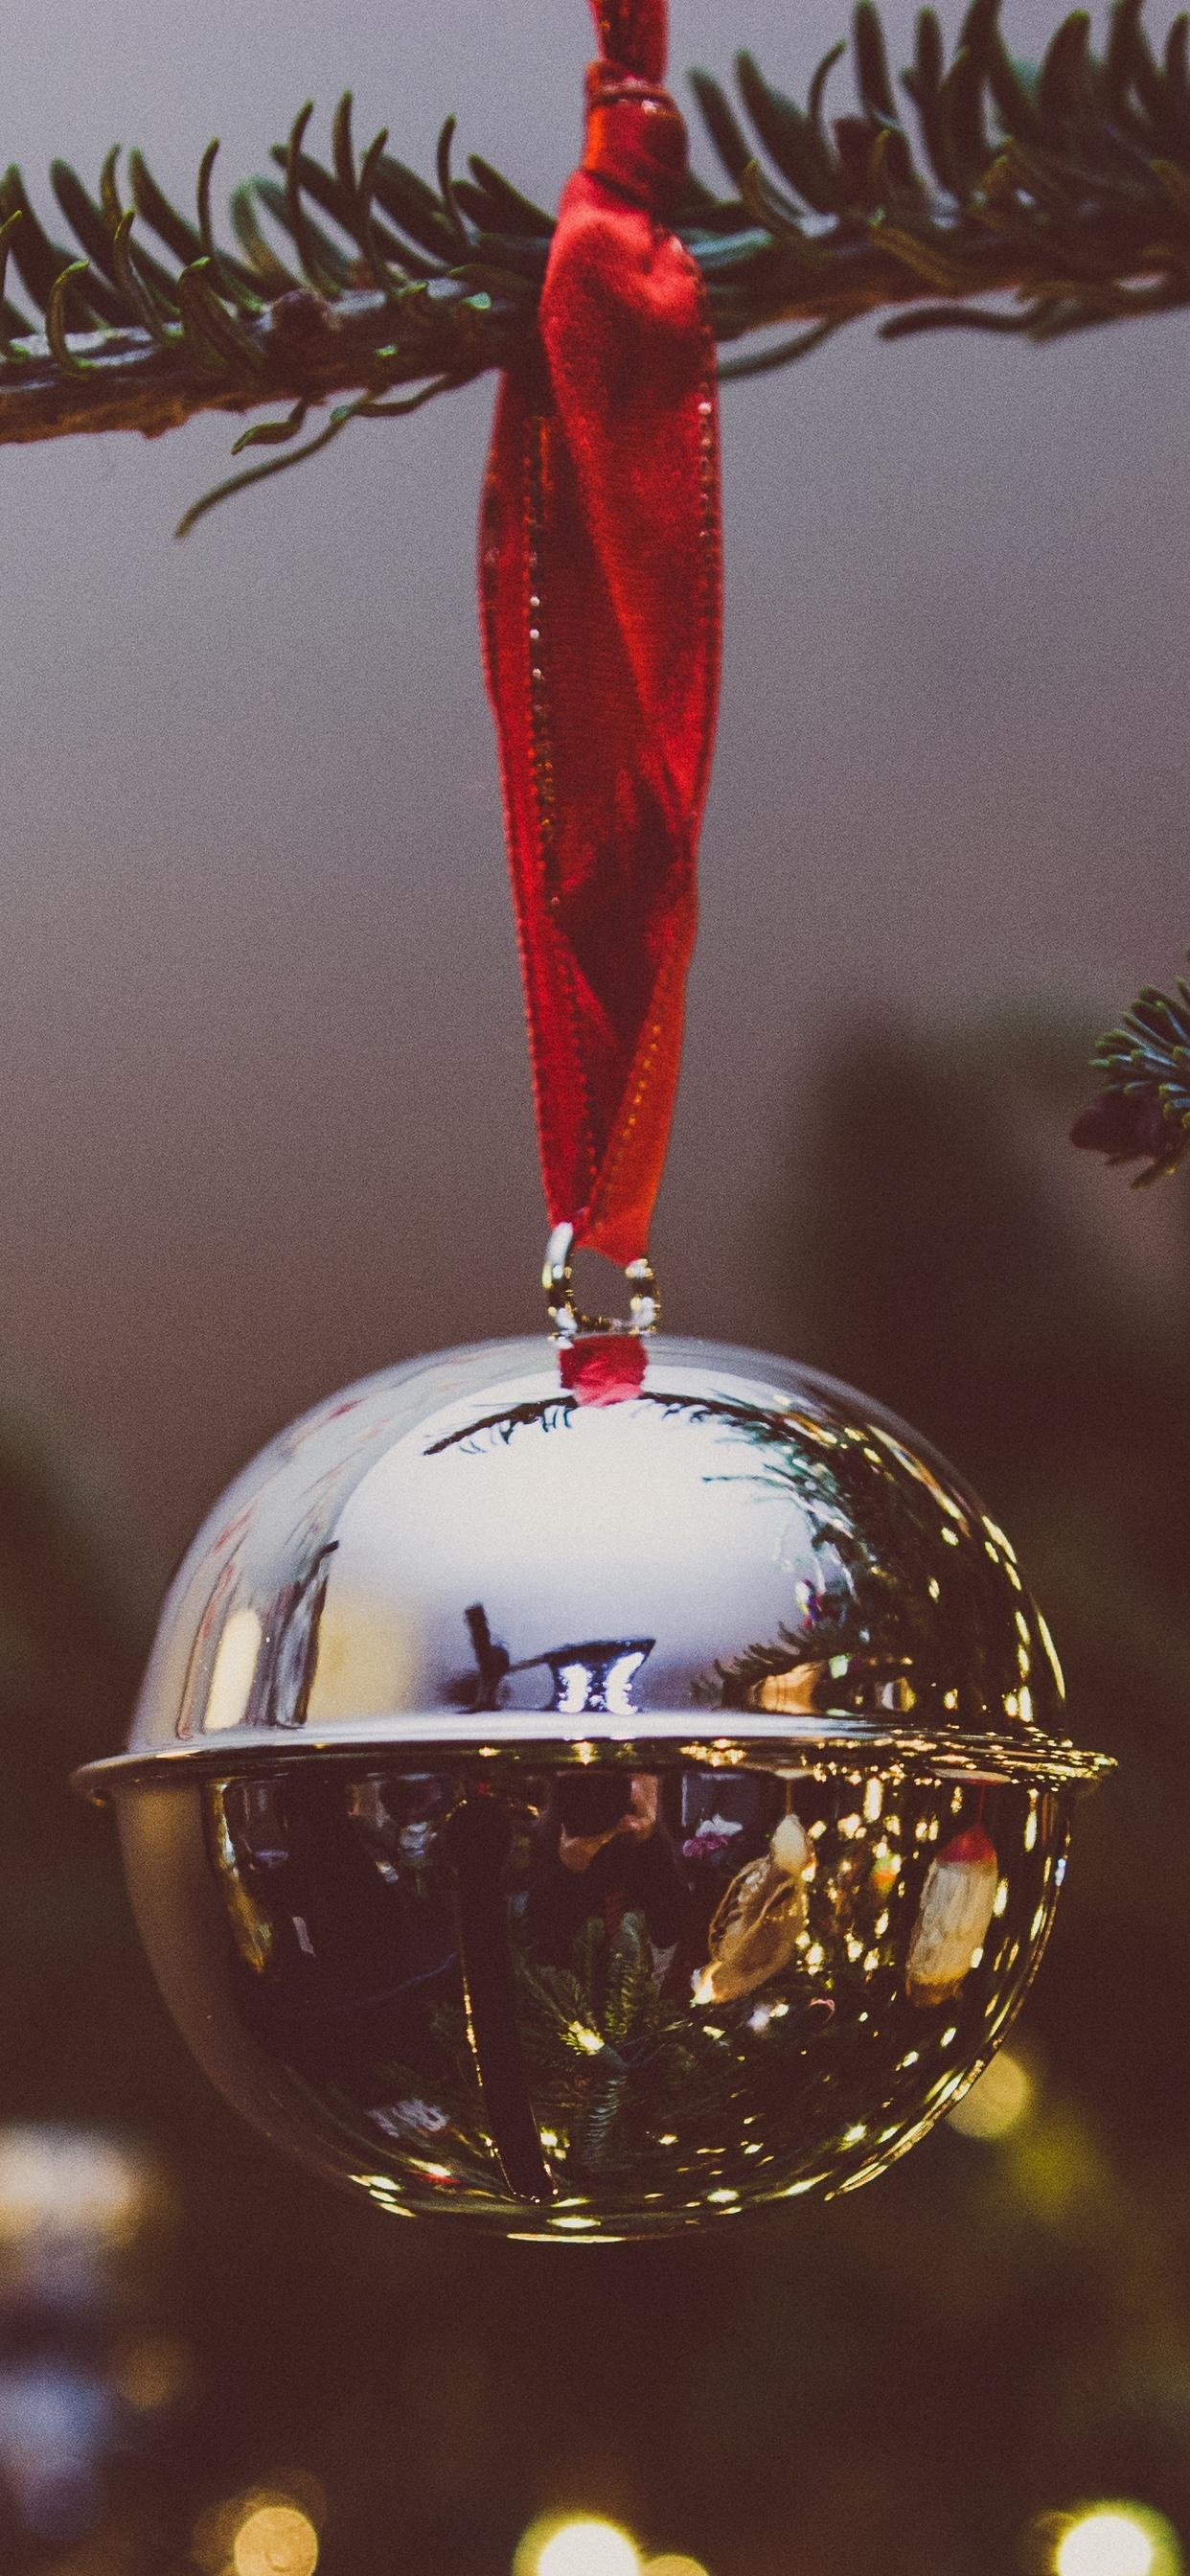 erin-walker-unsplash-christmas-silver-bell-iphone-wallpaper